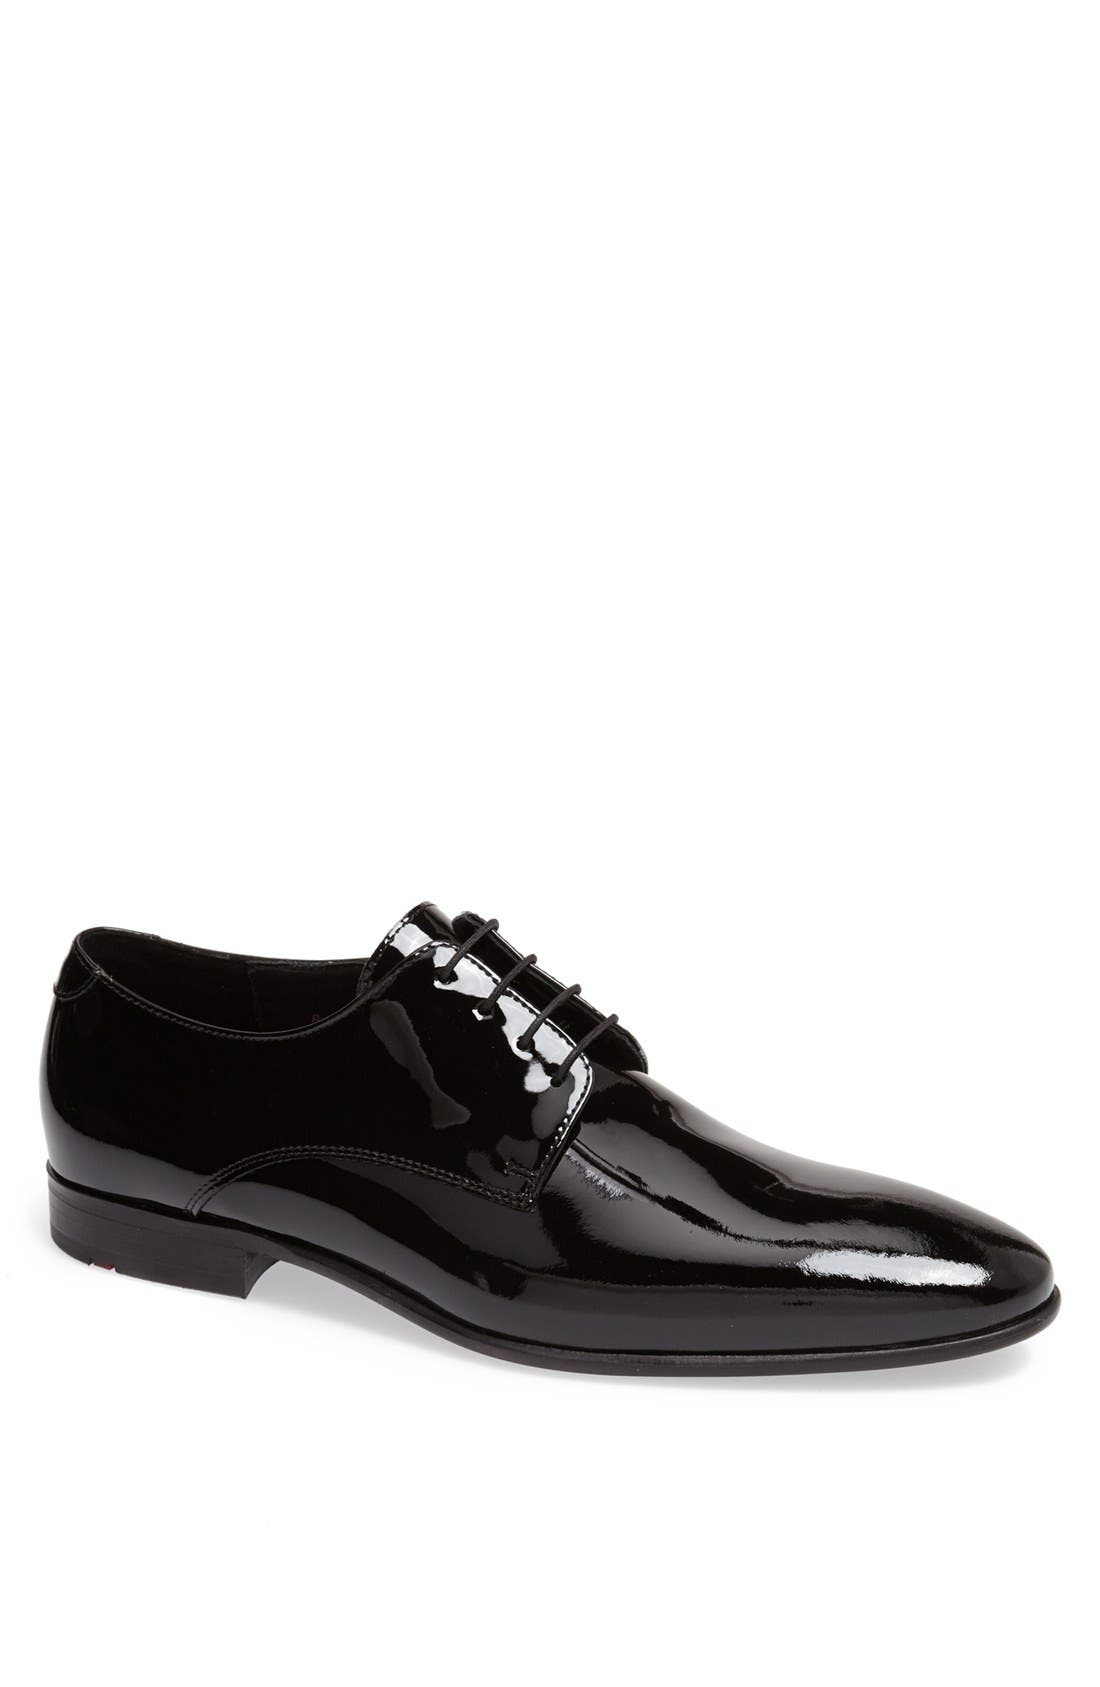 'Jerez' Plain Toe Derby,                             Main thumbnail 1, color,                             BLACK PATENT